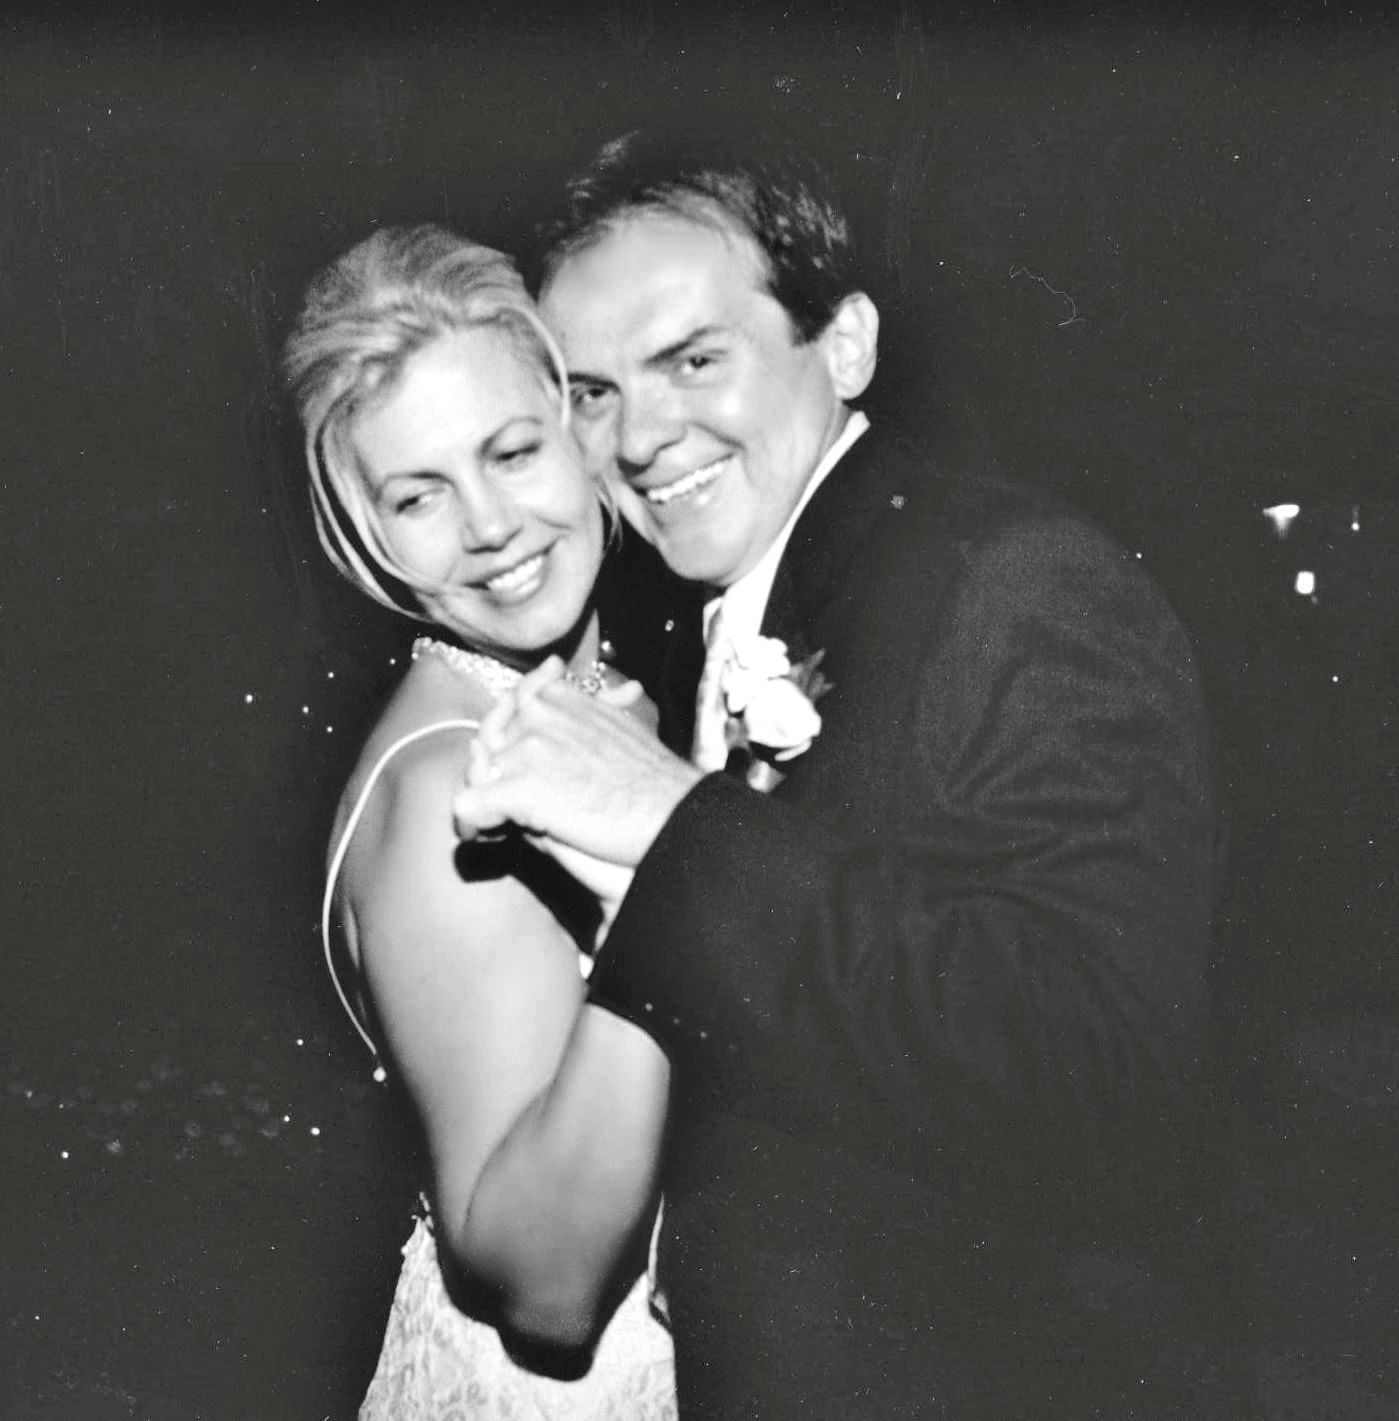 Scott and Heather Wedding dance with boost.jpg